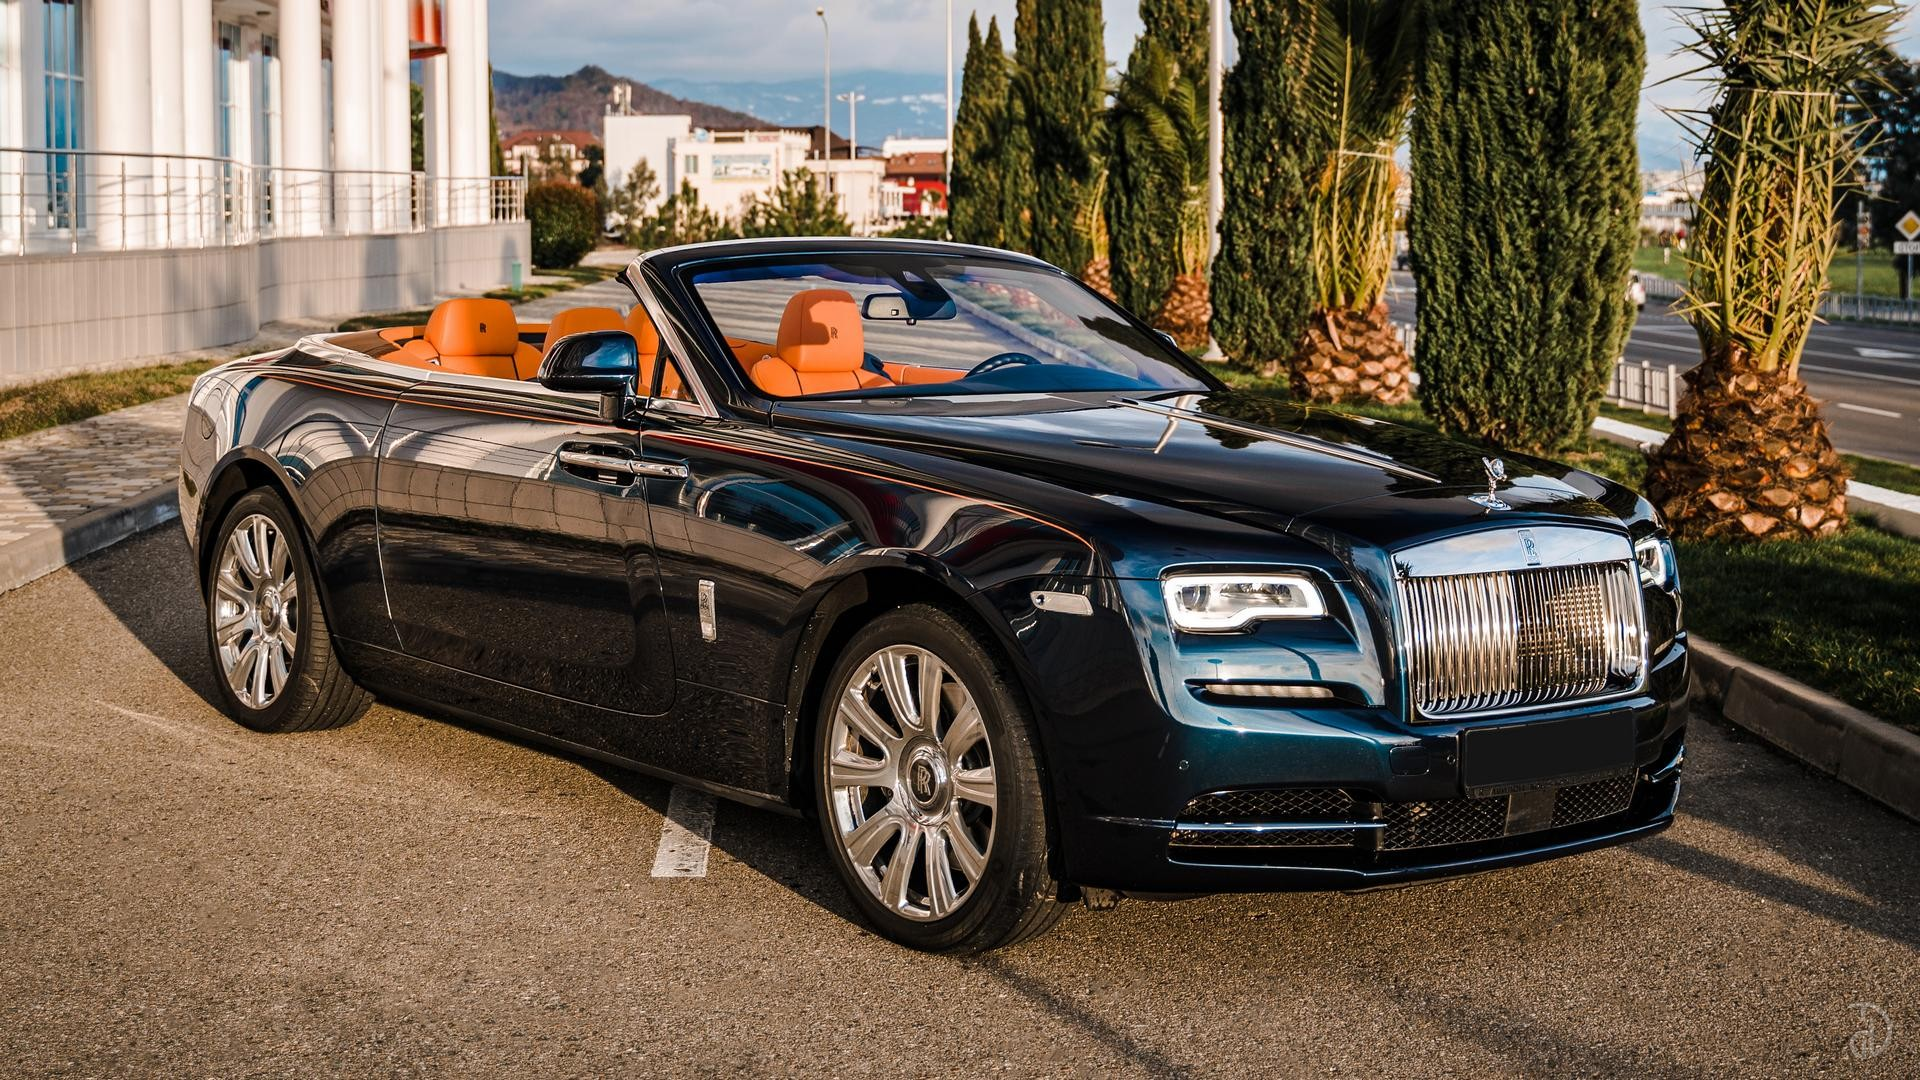 Аренда Rolls-Royce Dawn в Сочи. Фото 6